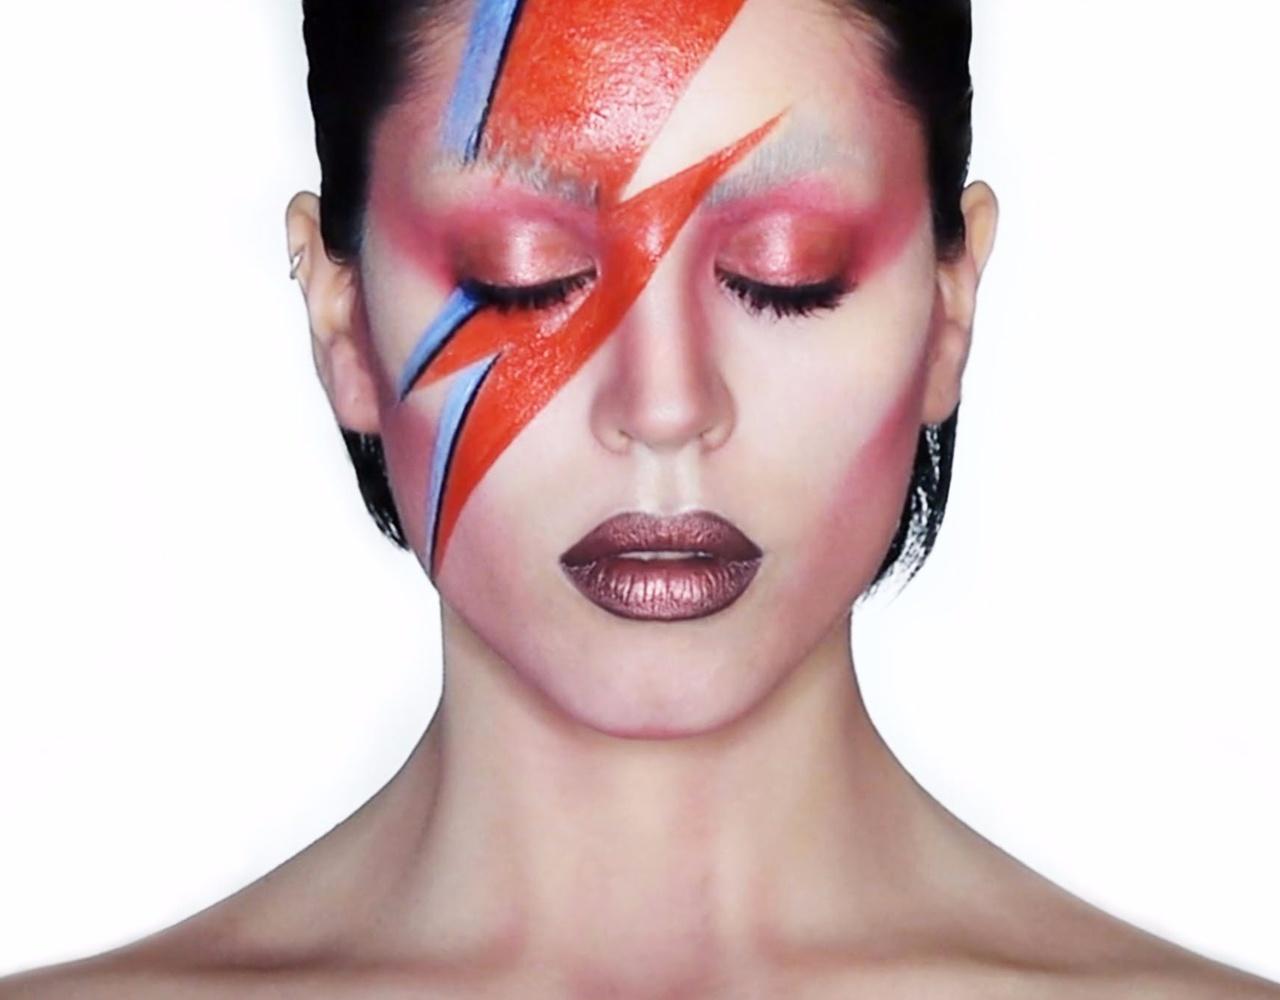 Claire Dim | 大卫鲍伊Aladdin Sane仿妆 David Bowie Makeup Tribute